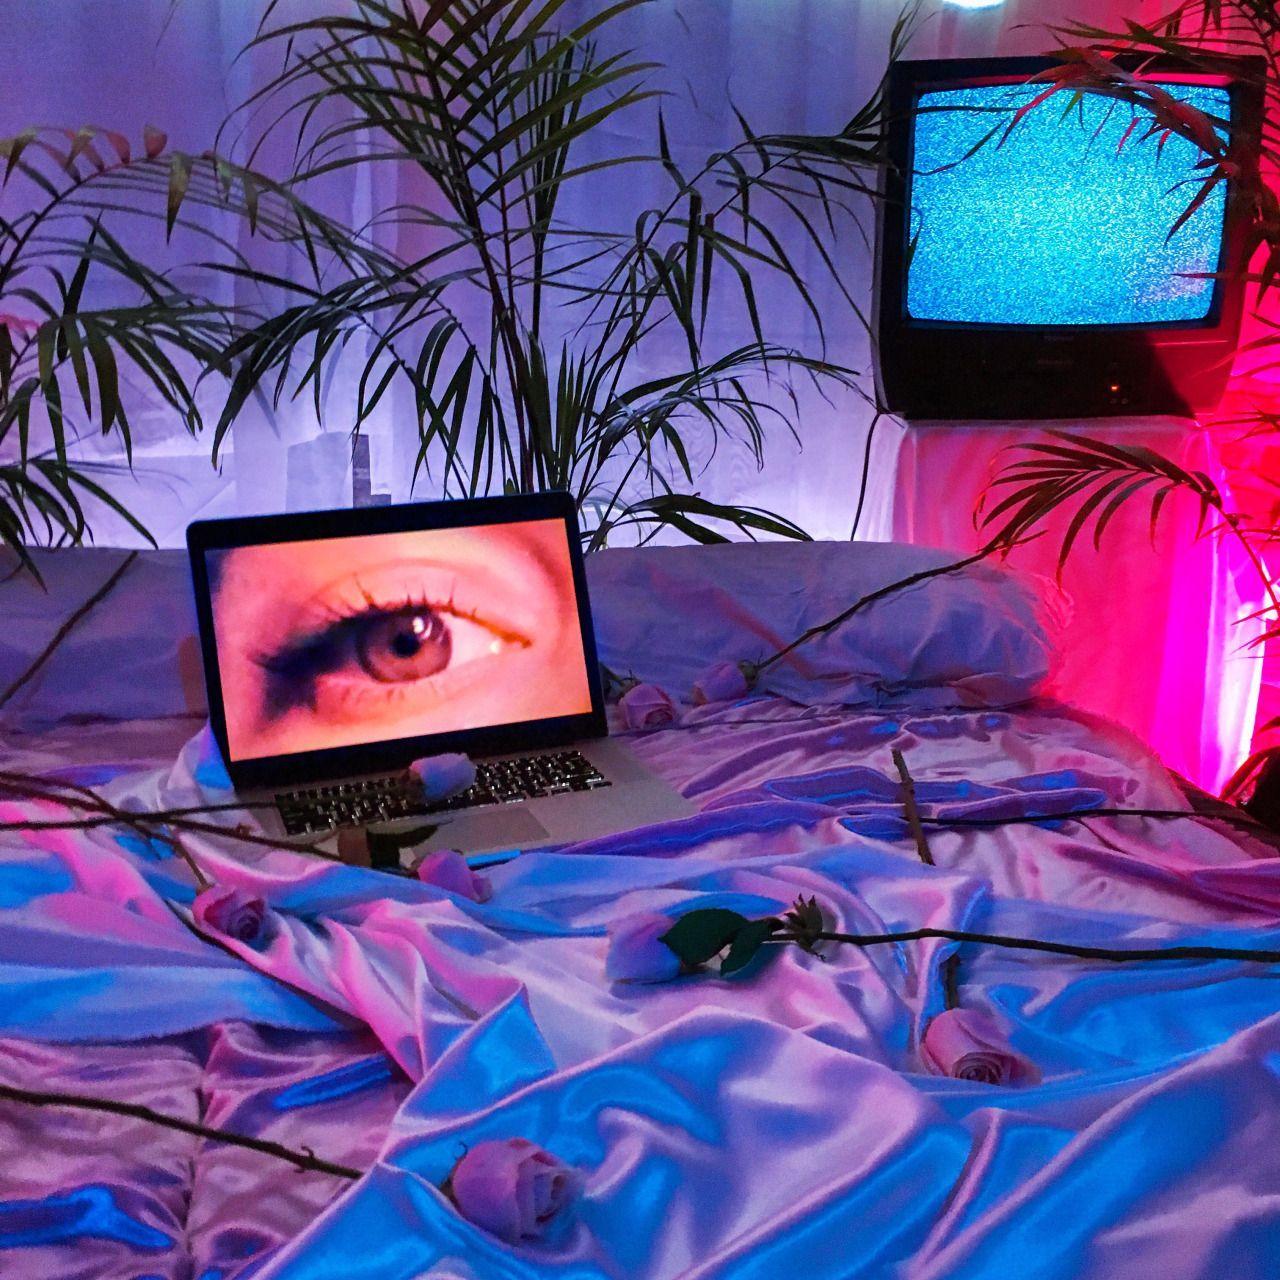 erotically uninterested   Feminist artist, Vaporwave, Neon